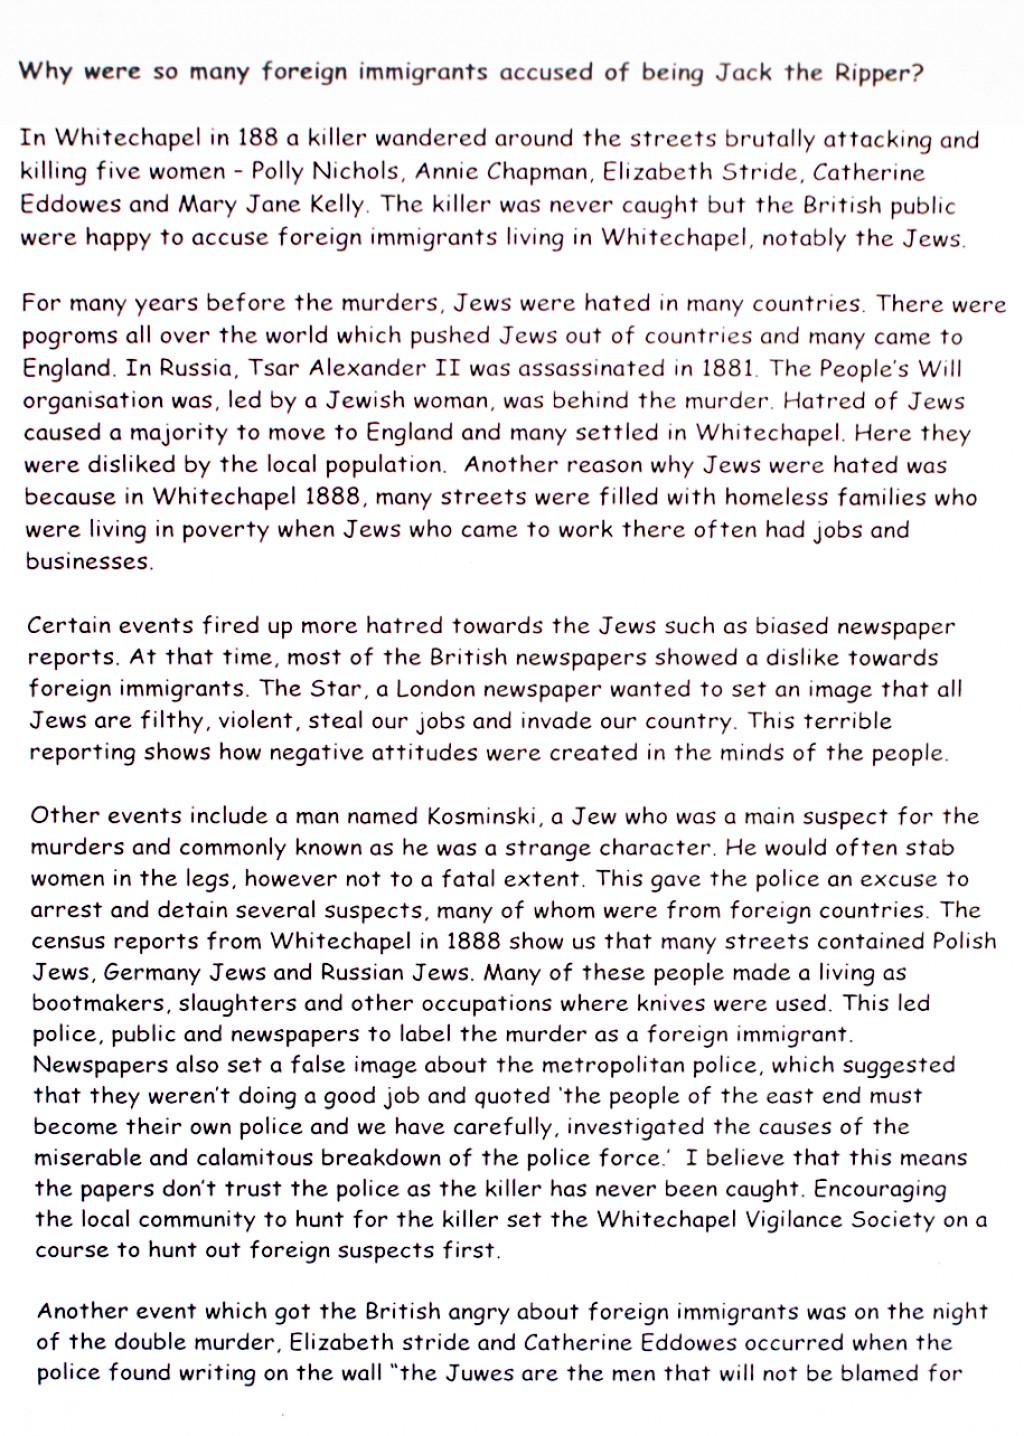 008 History Essay Example History20level207201 120a Tcm8 Beautiful Introduction Pdf A Level Large